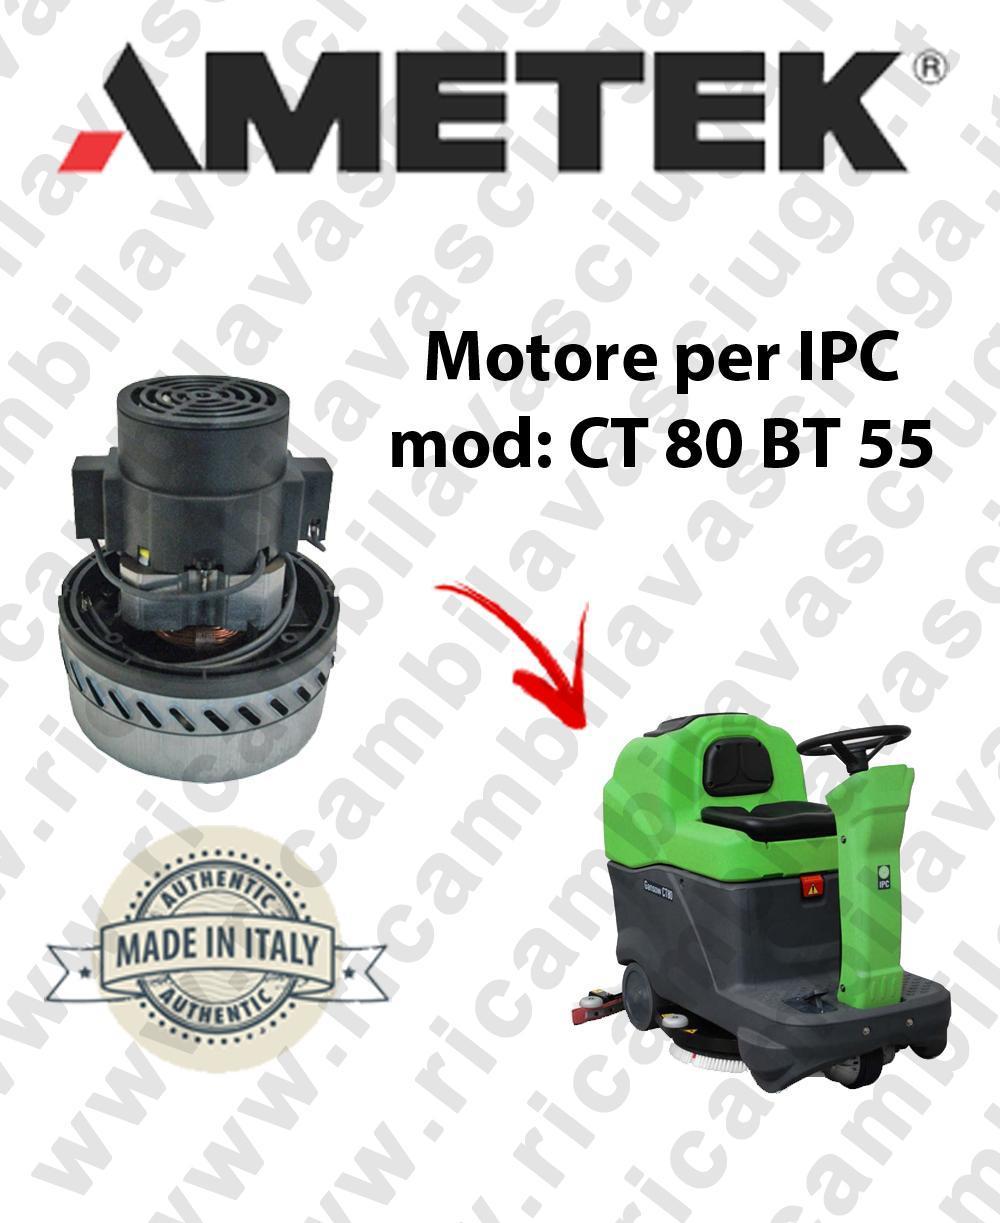 CT 80 BT 55 motor de aspiración Ametek para fregadora IPC